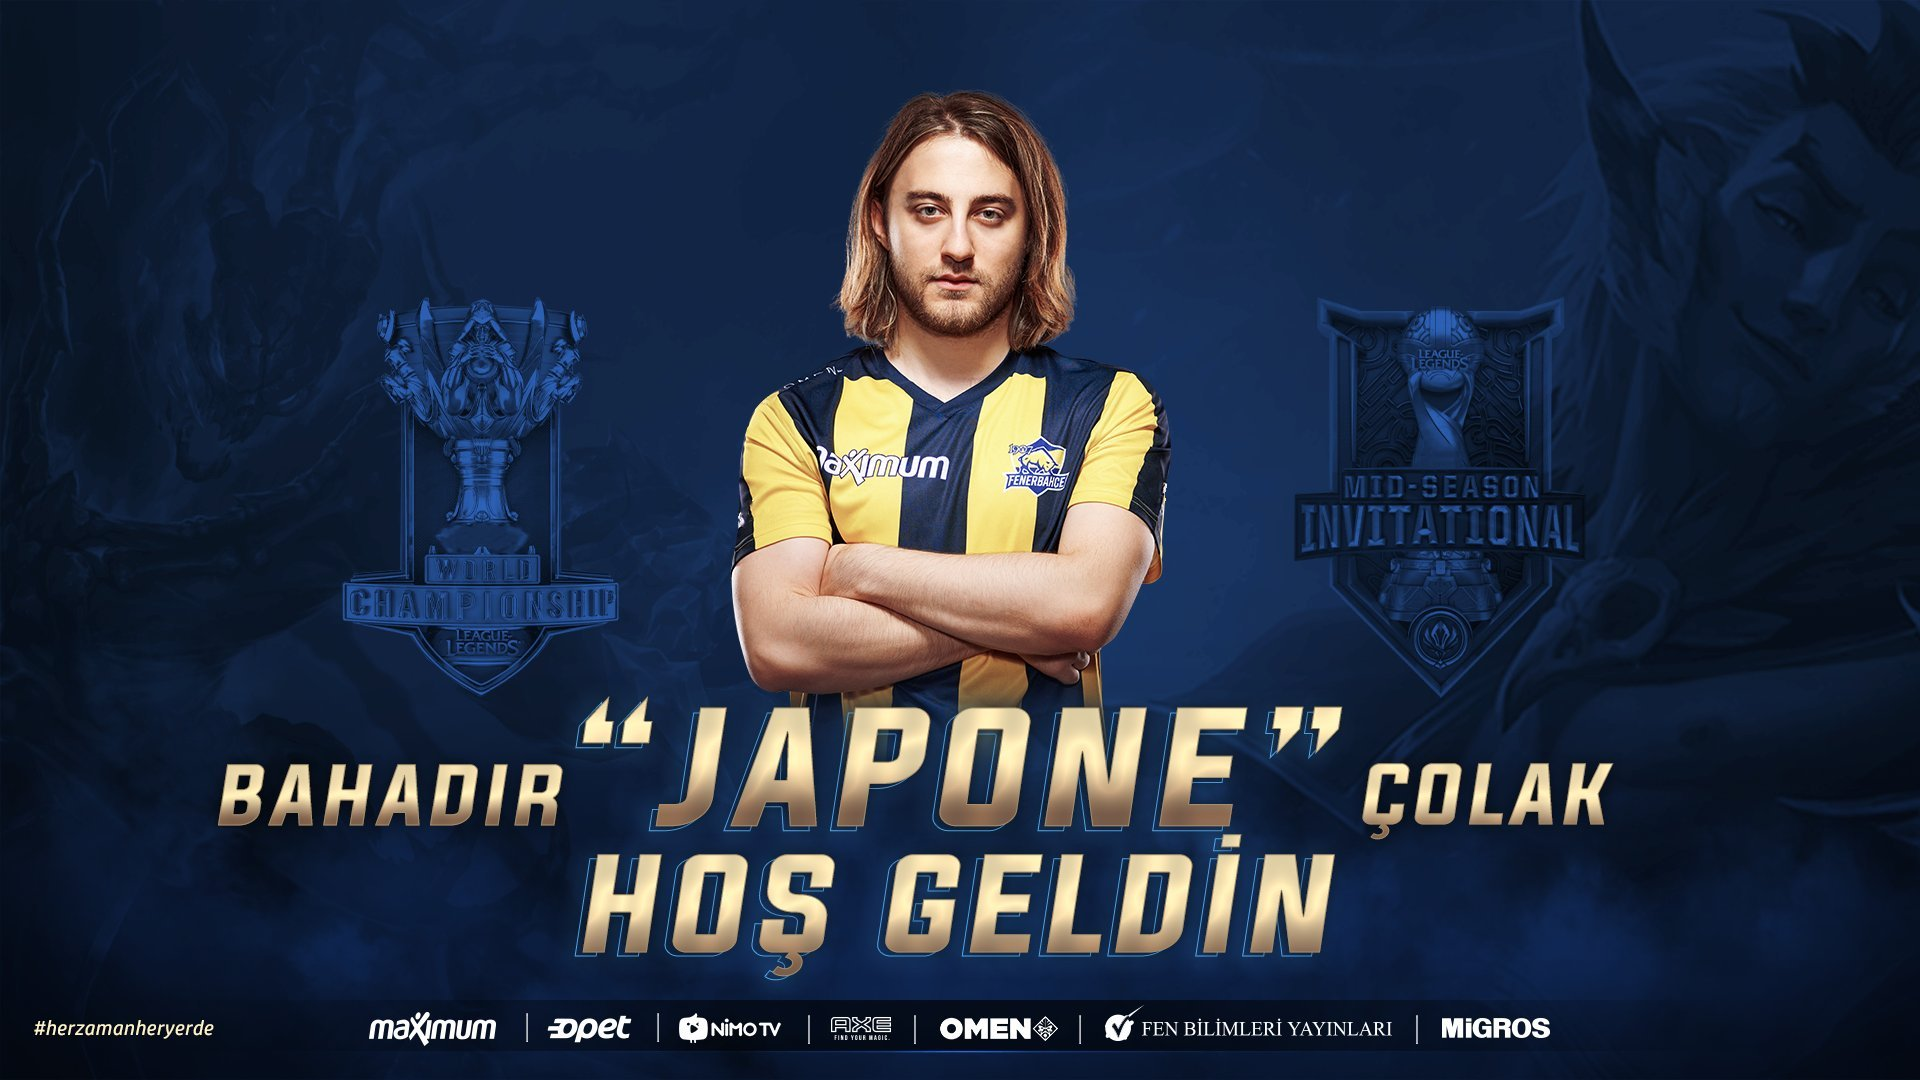 Japone Yeniden 1907 Fenerbahçe'de